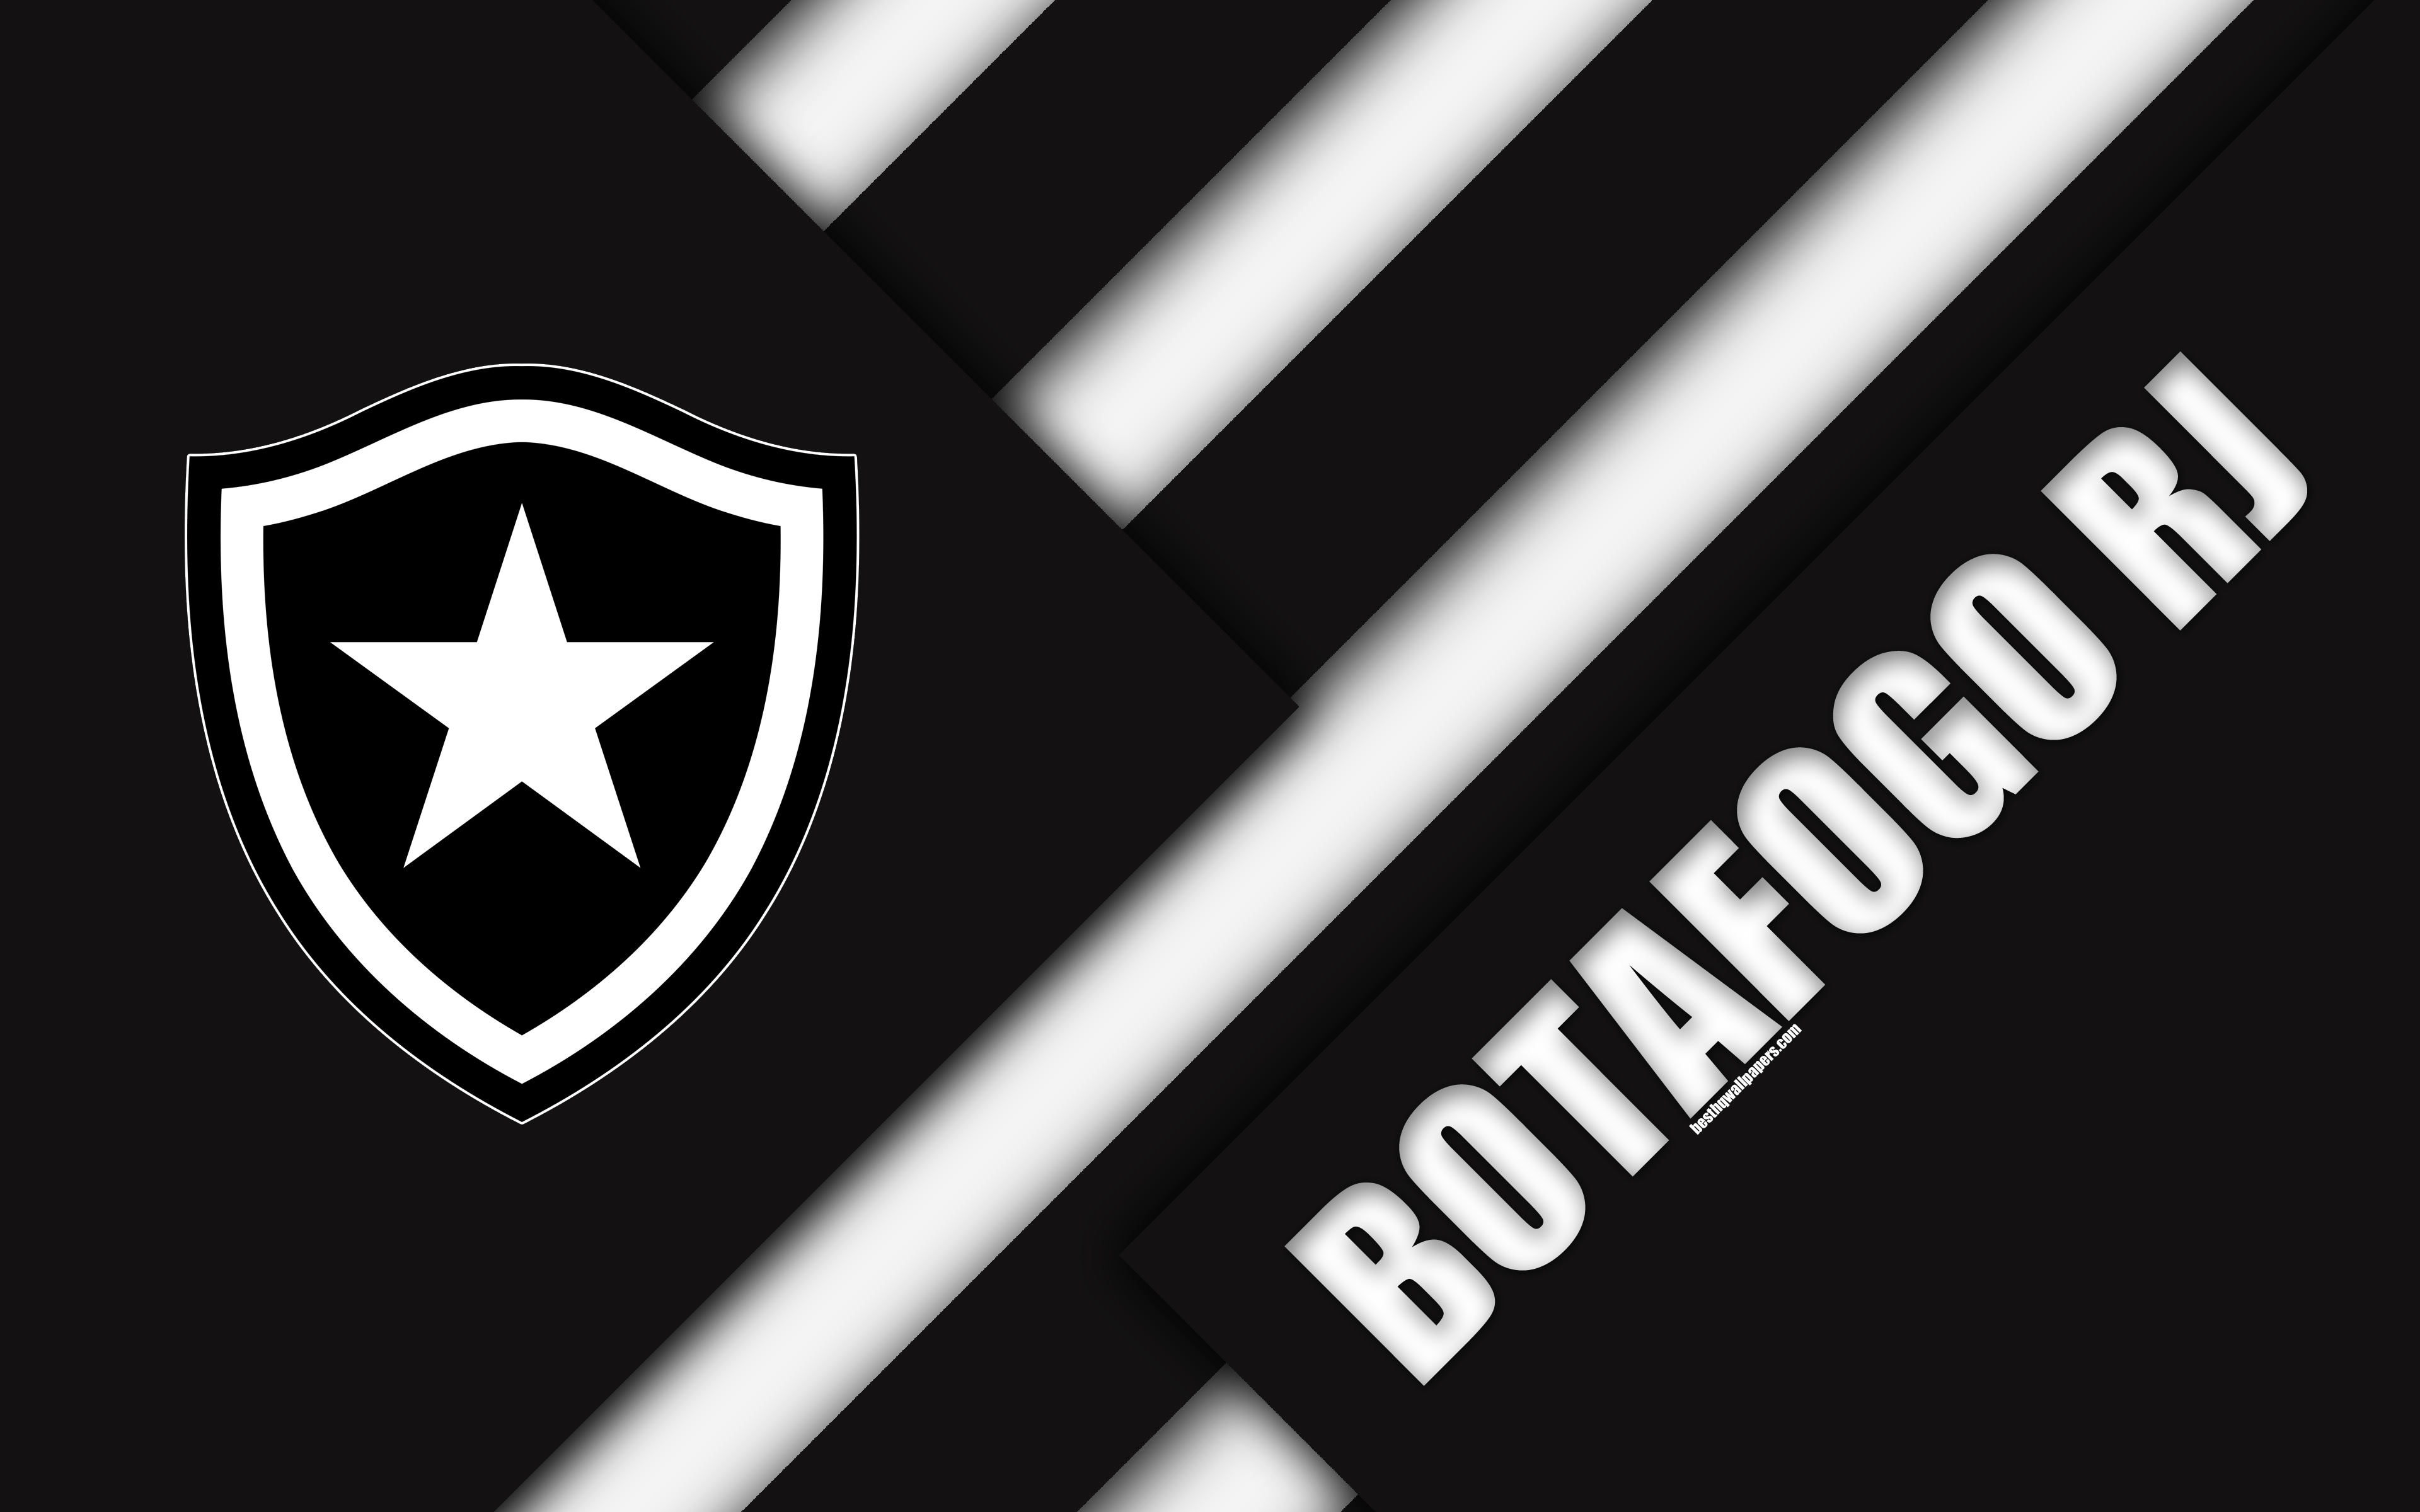 Download wallpapers Botafogo RJ FC Rio de Janeiro Brazil 4k 3840x2400